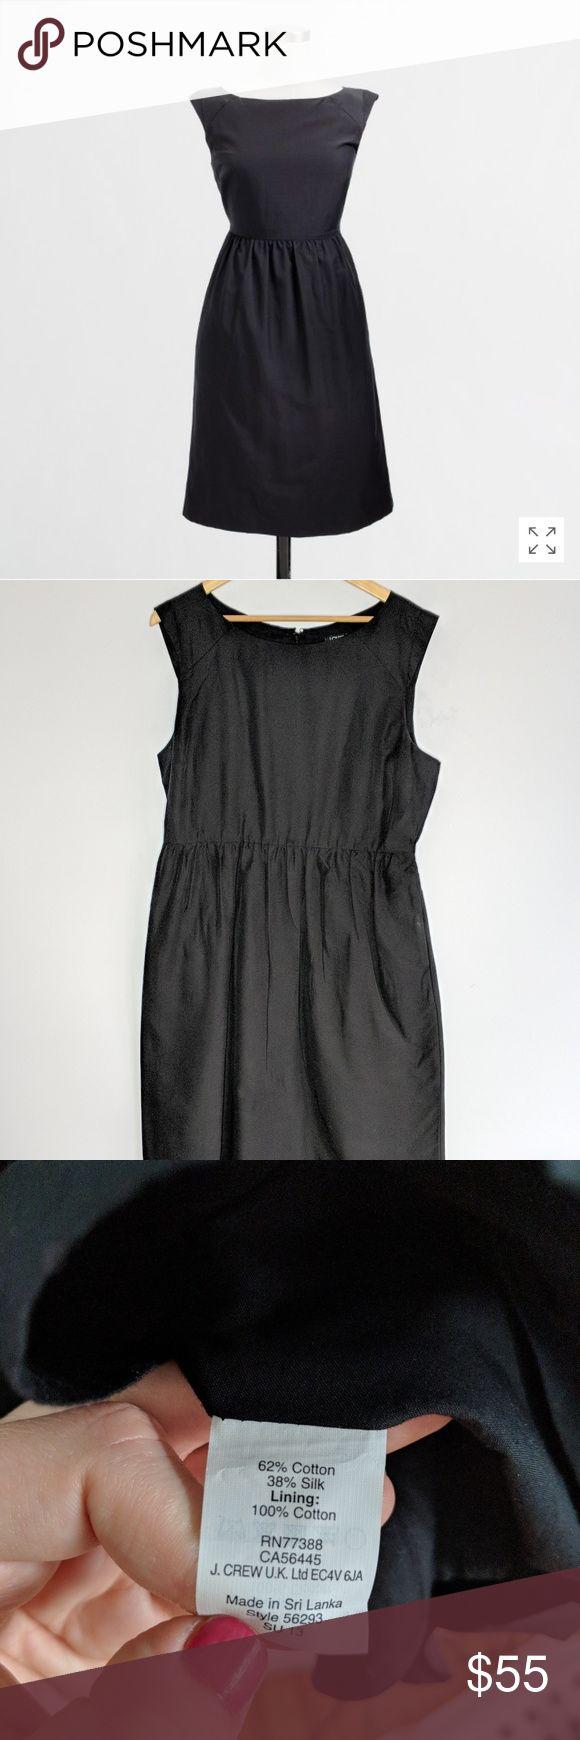 J Crew Cora Dress